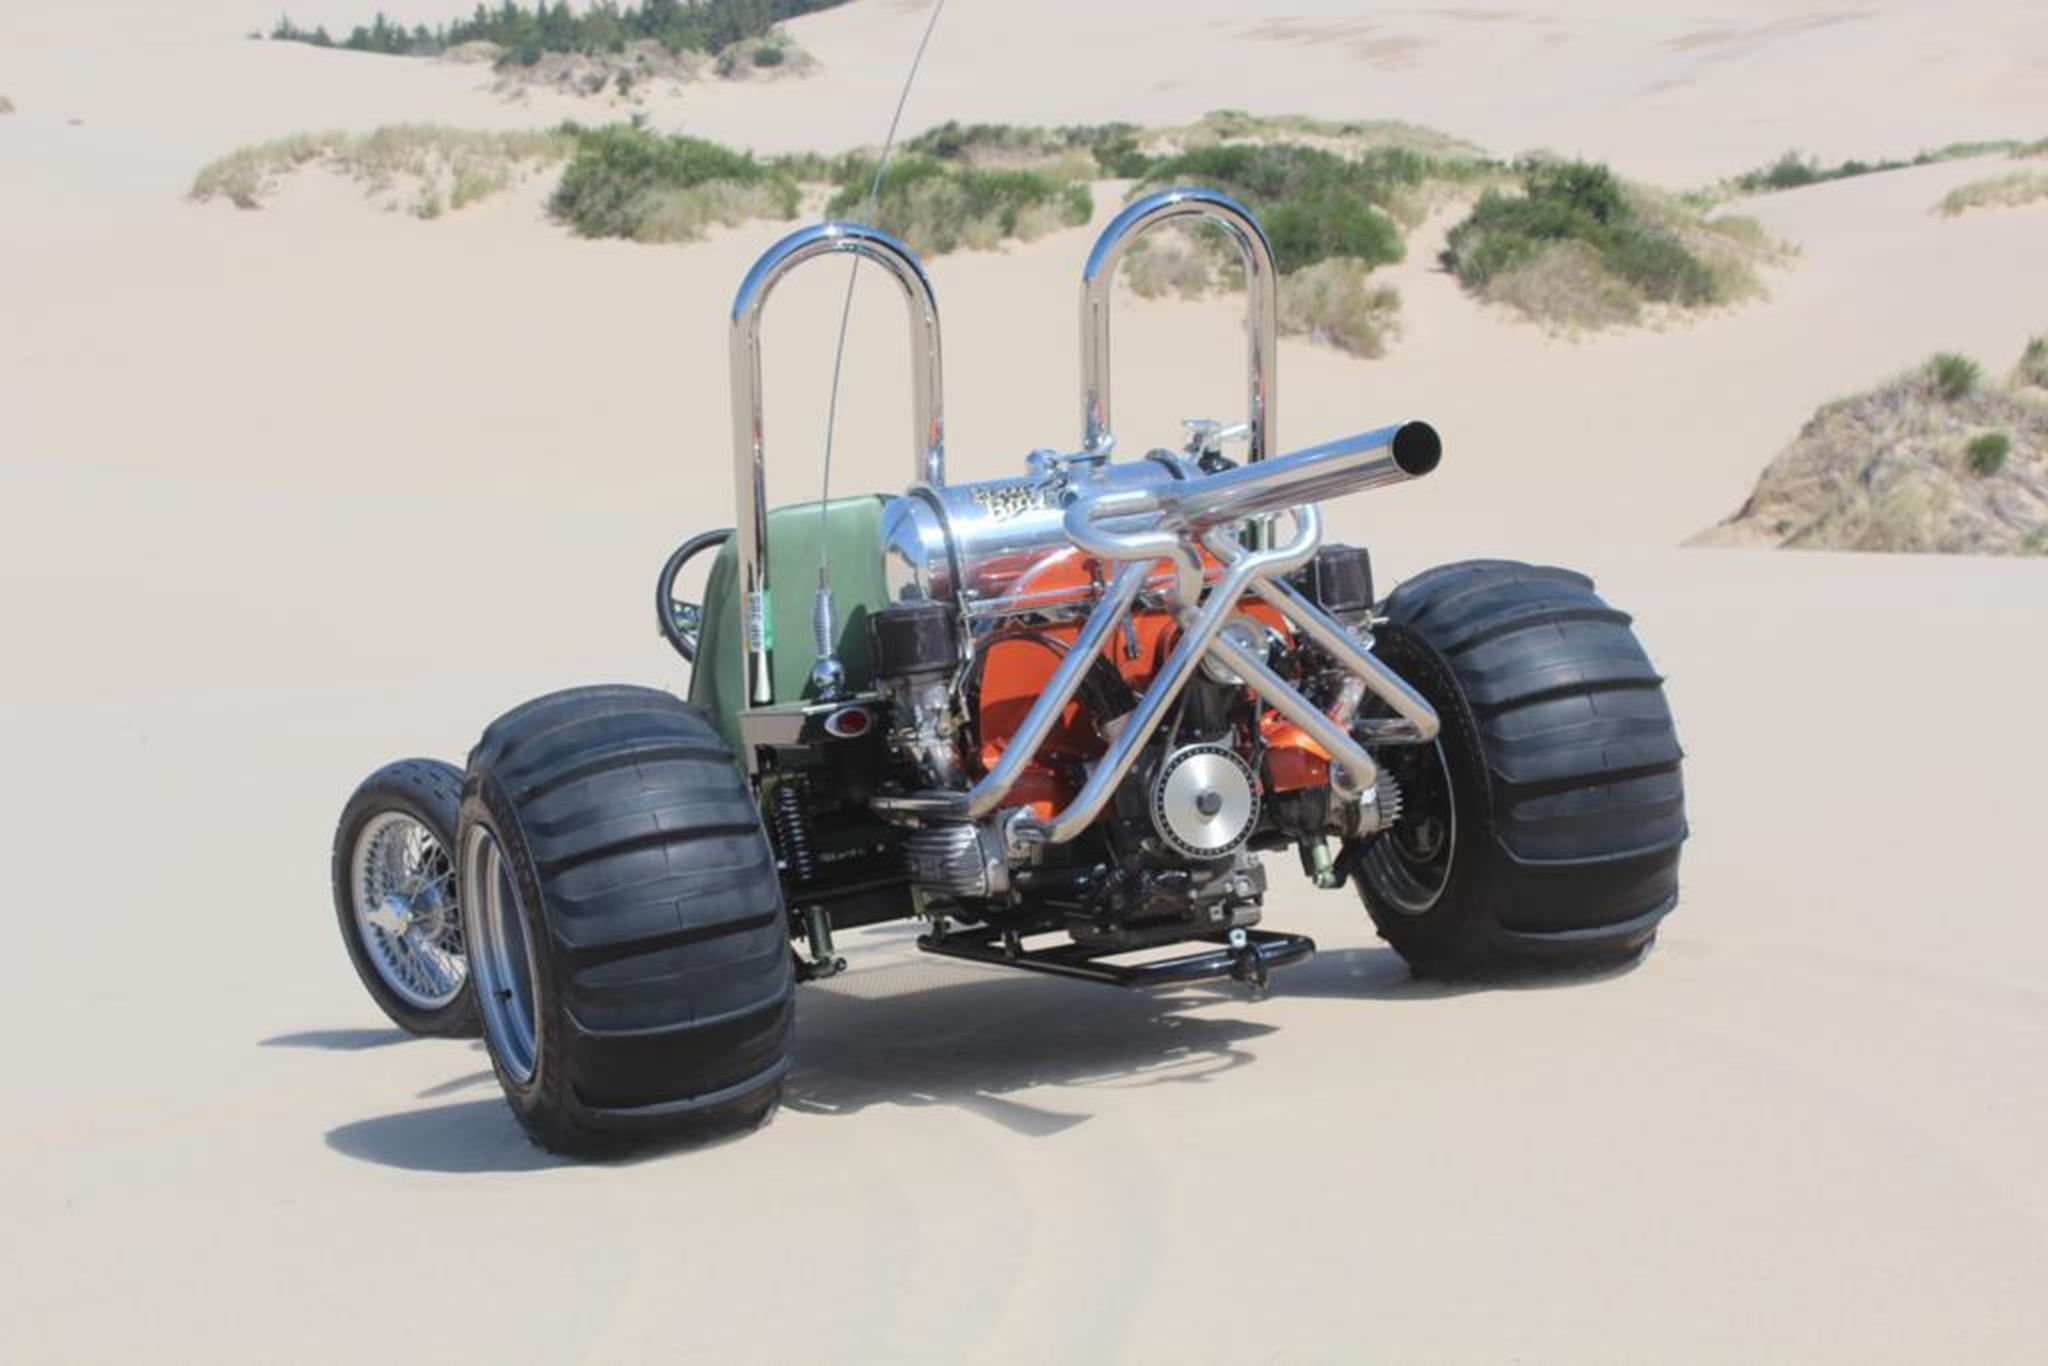 Cort S Dune Buggy Peninsula Automotive